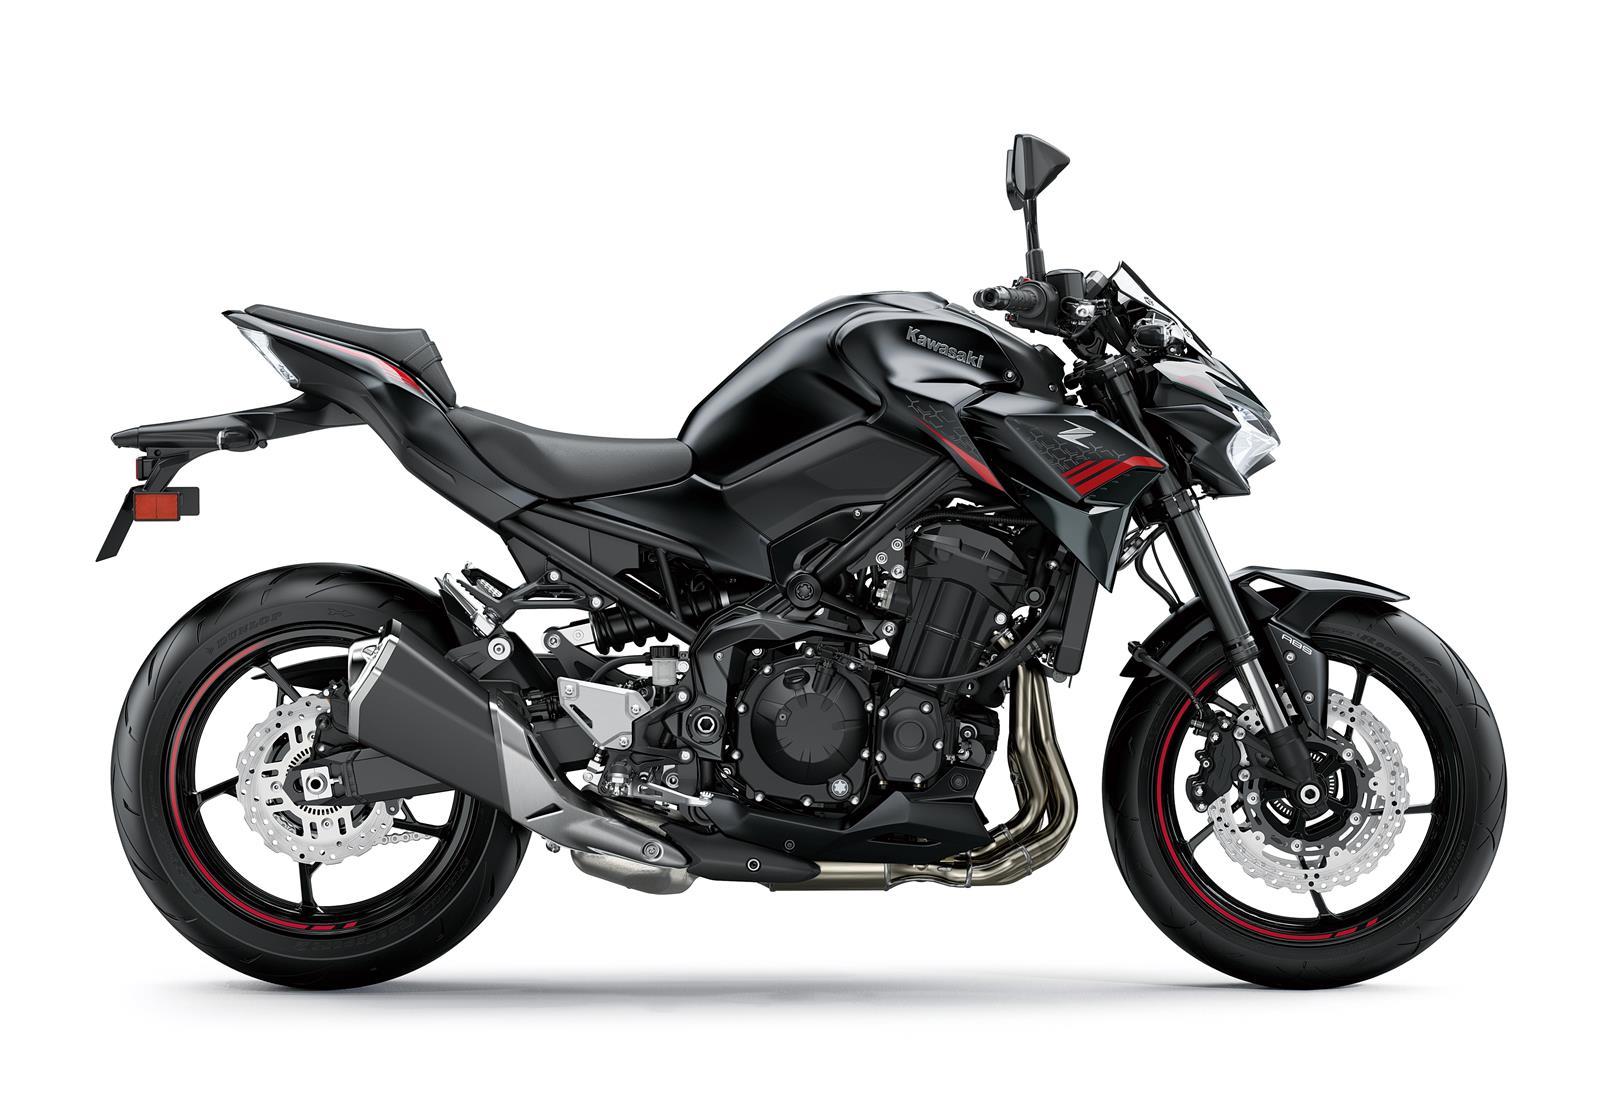 Вид справа на мотоцикл Кавасаки 900 нового 2020 модельного года